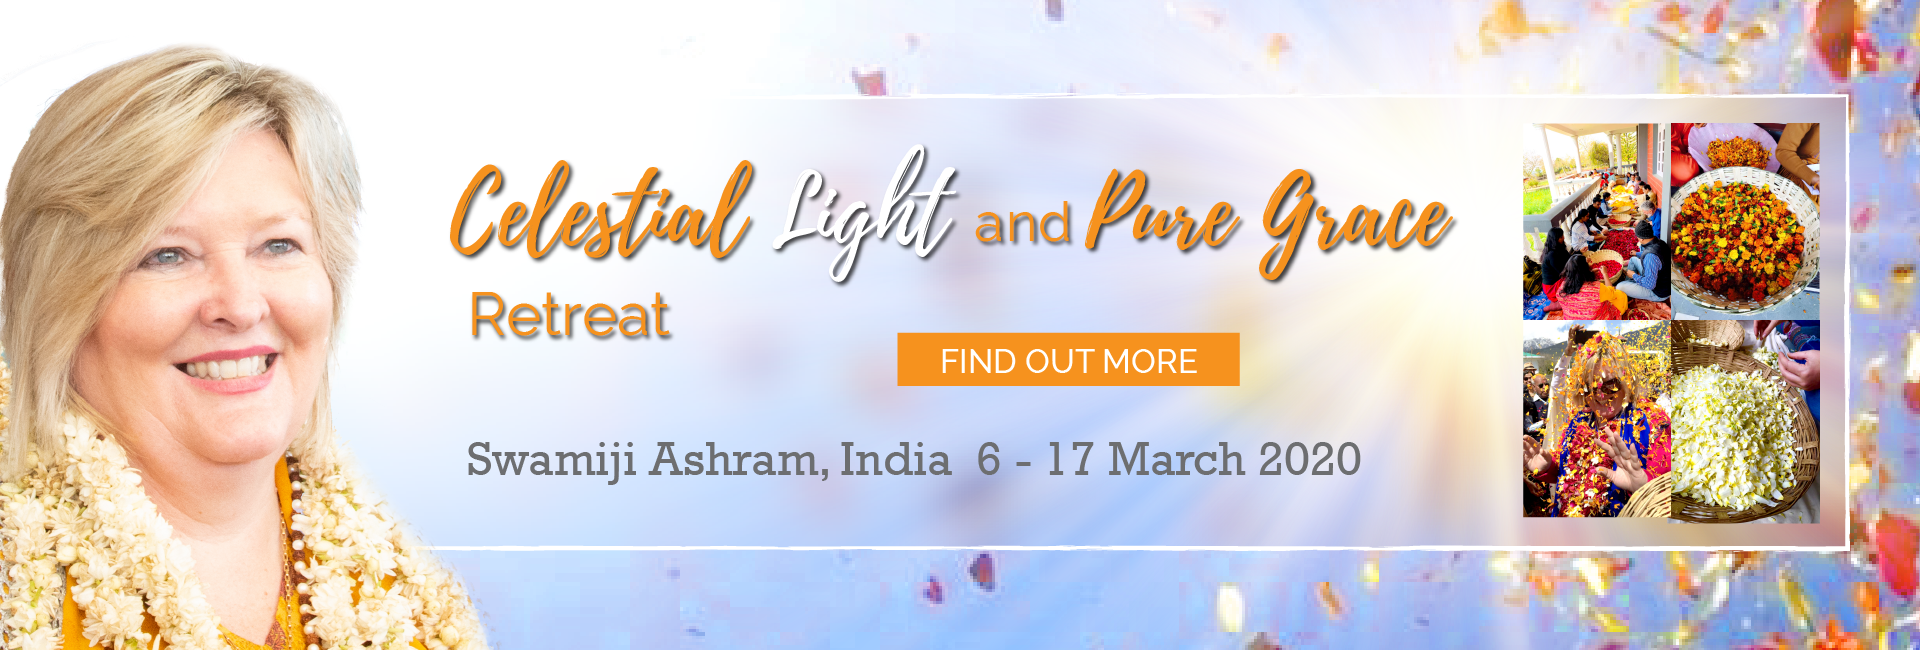 Celestial Light and Pure Grace Retreat with Shakti Durga